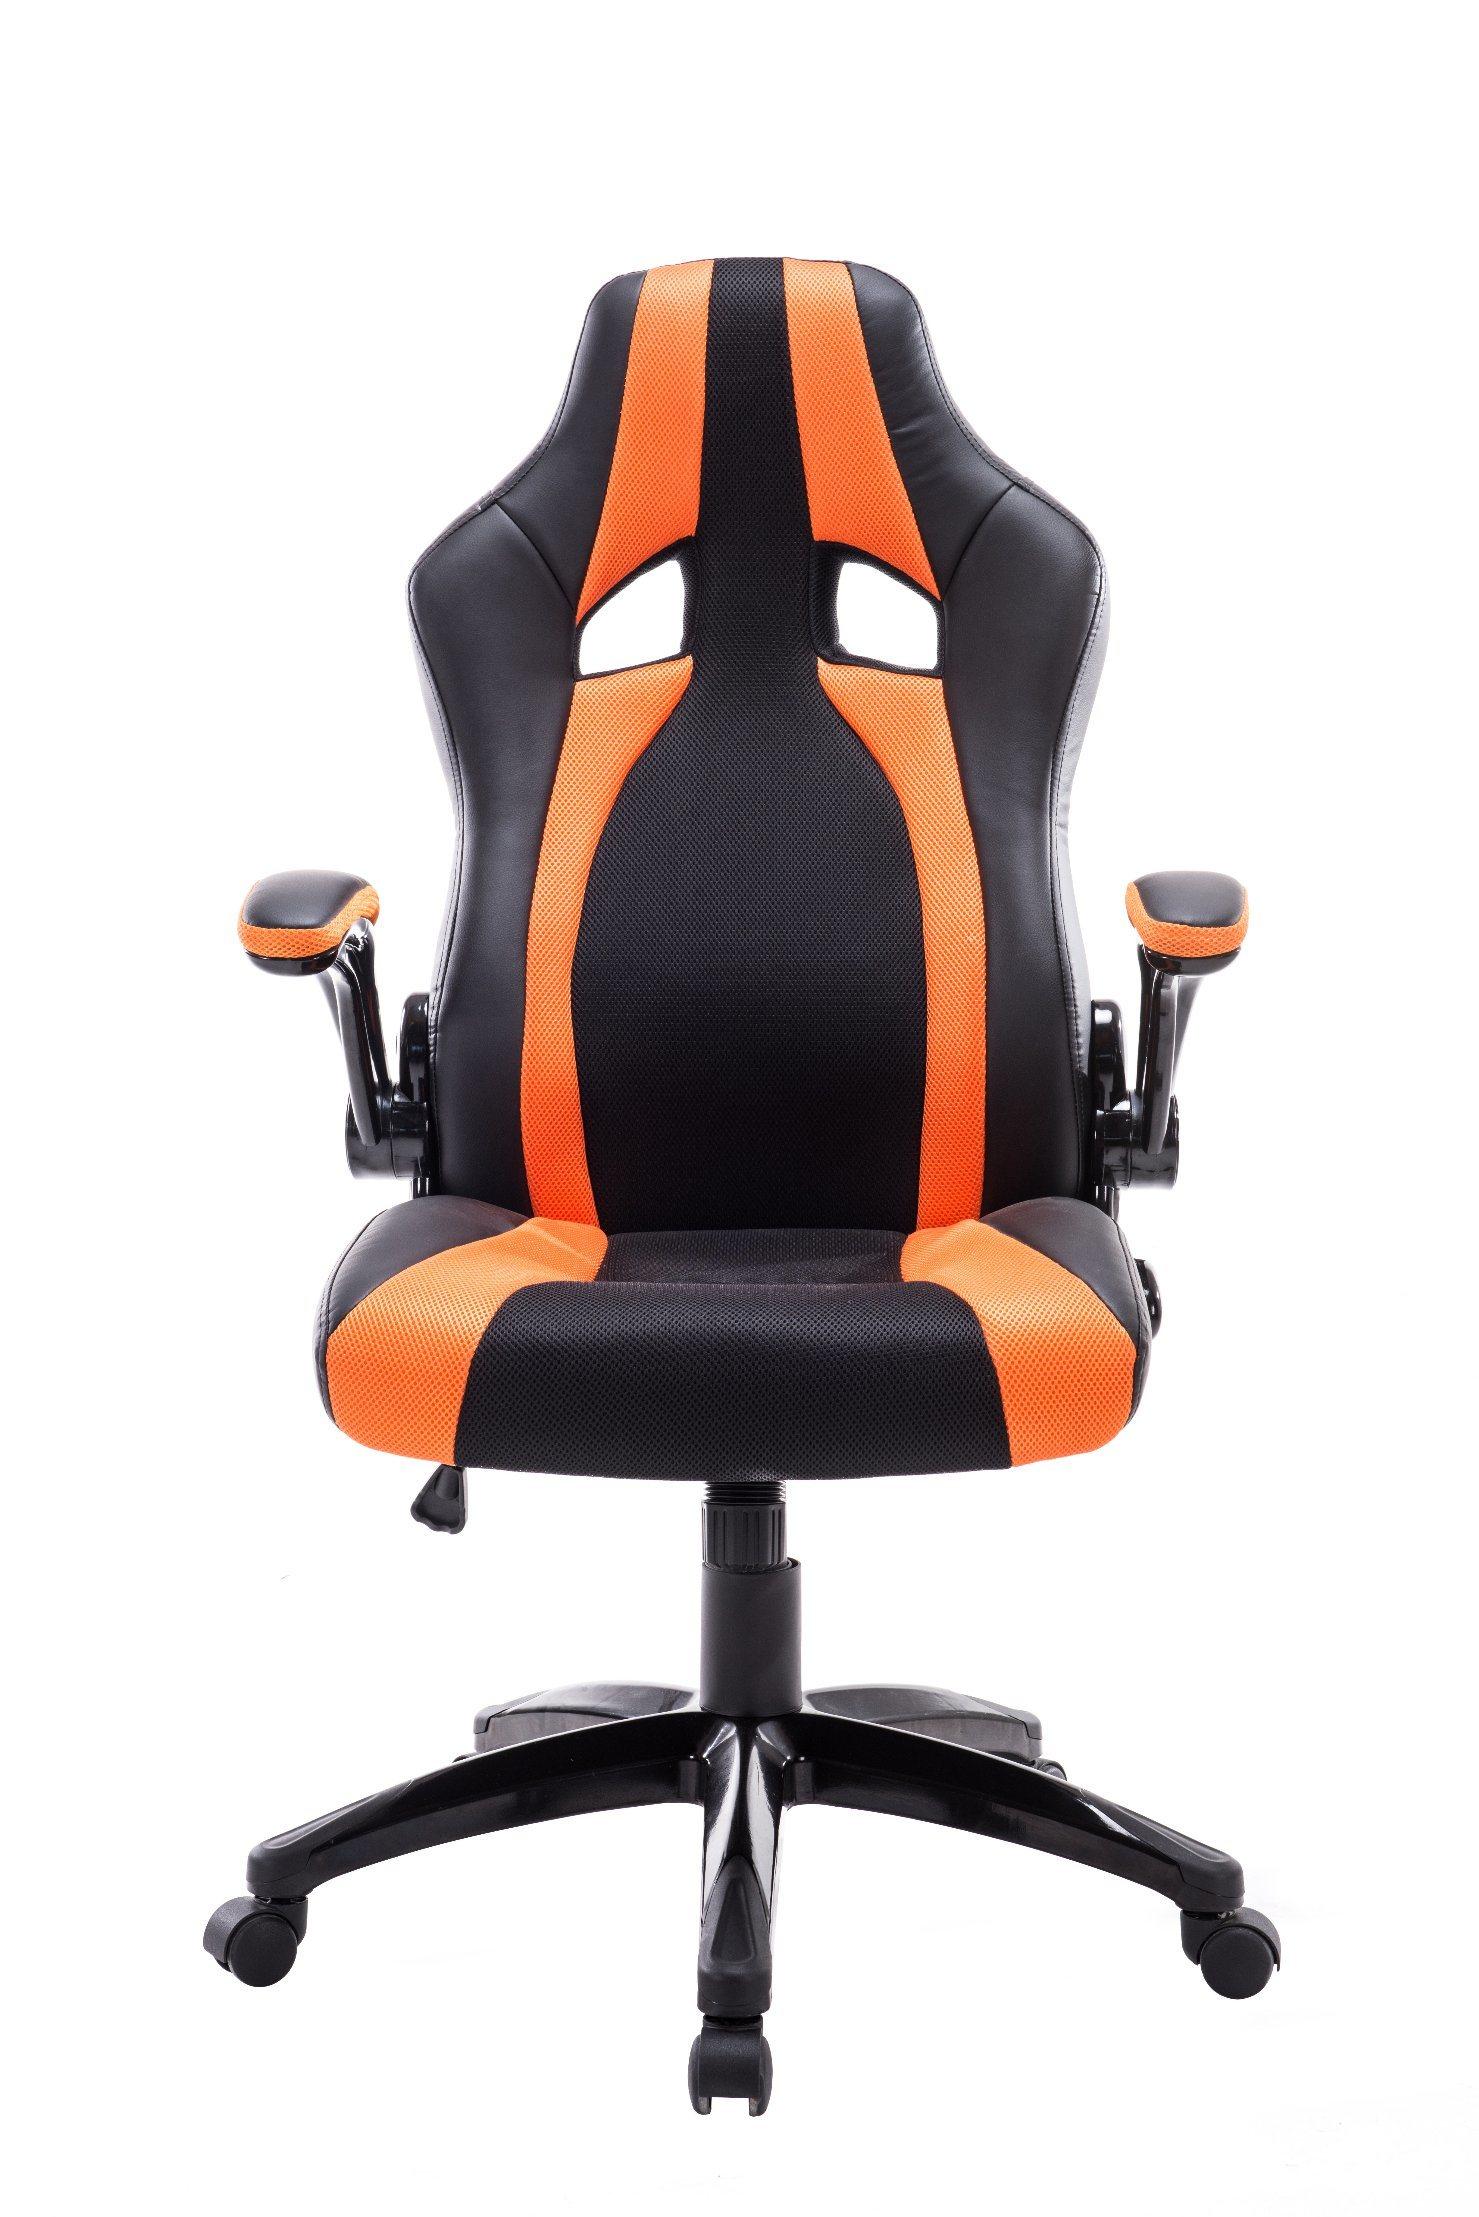 Astonishing China Hot Sale Pu Leather Cheap Gaming Racing Chair Photos Machost Co Dining Chair Design Ideas Machostcouk